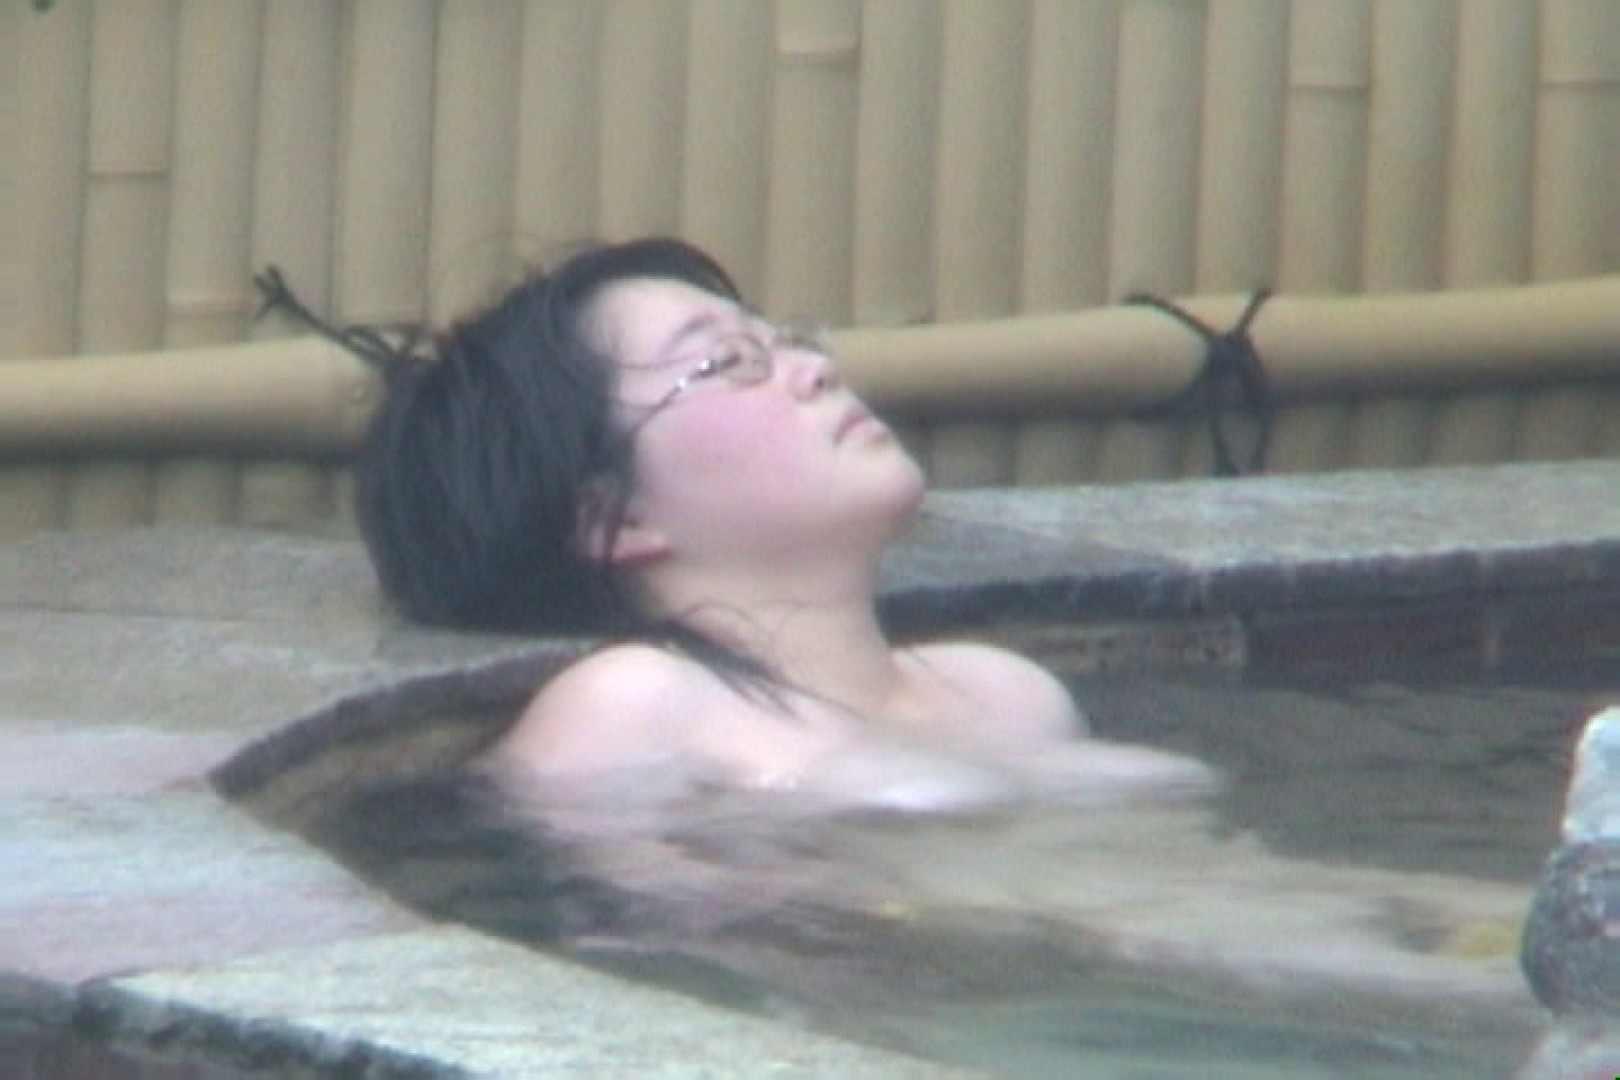 Aquaな露天風呂Vol.46【VIP限定】 0  54連発 8